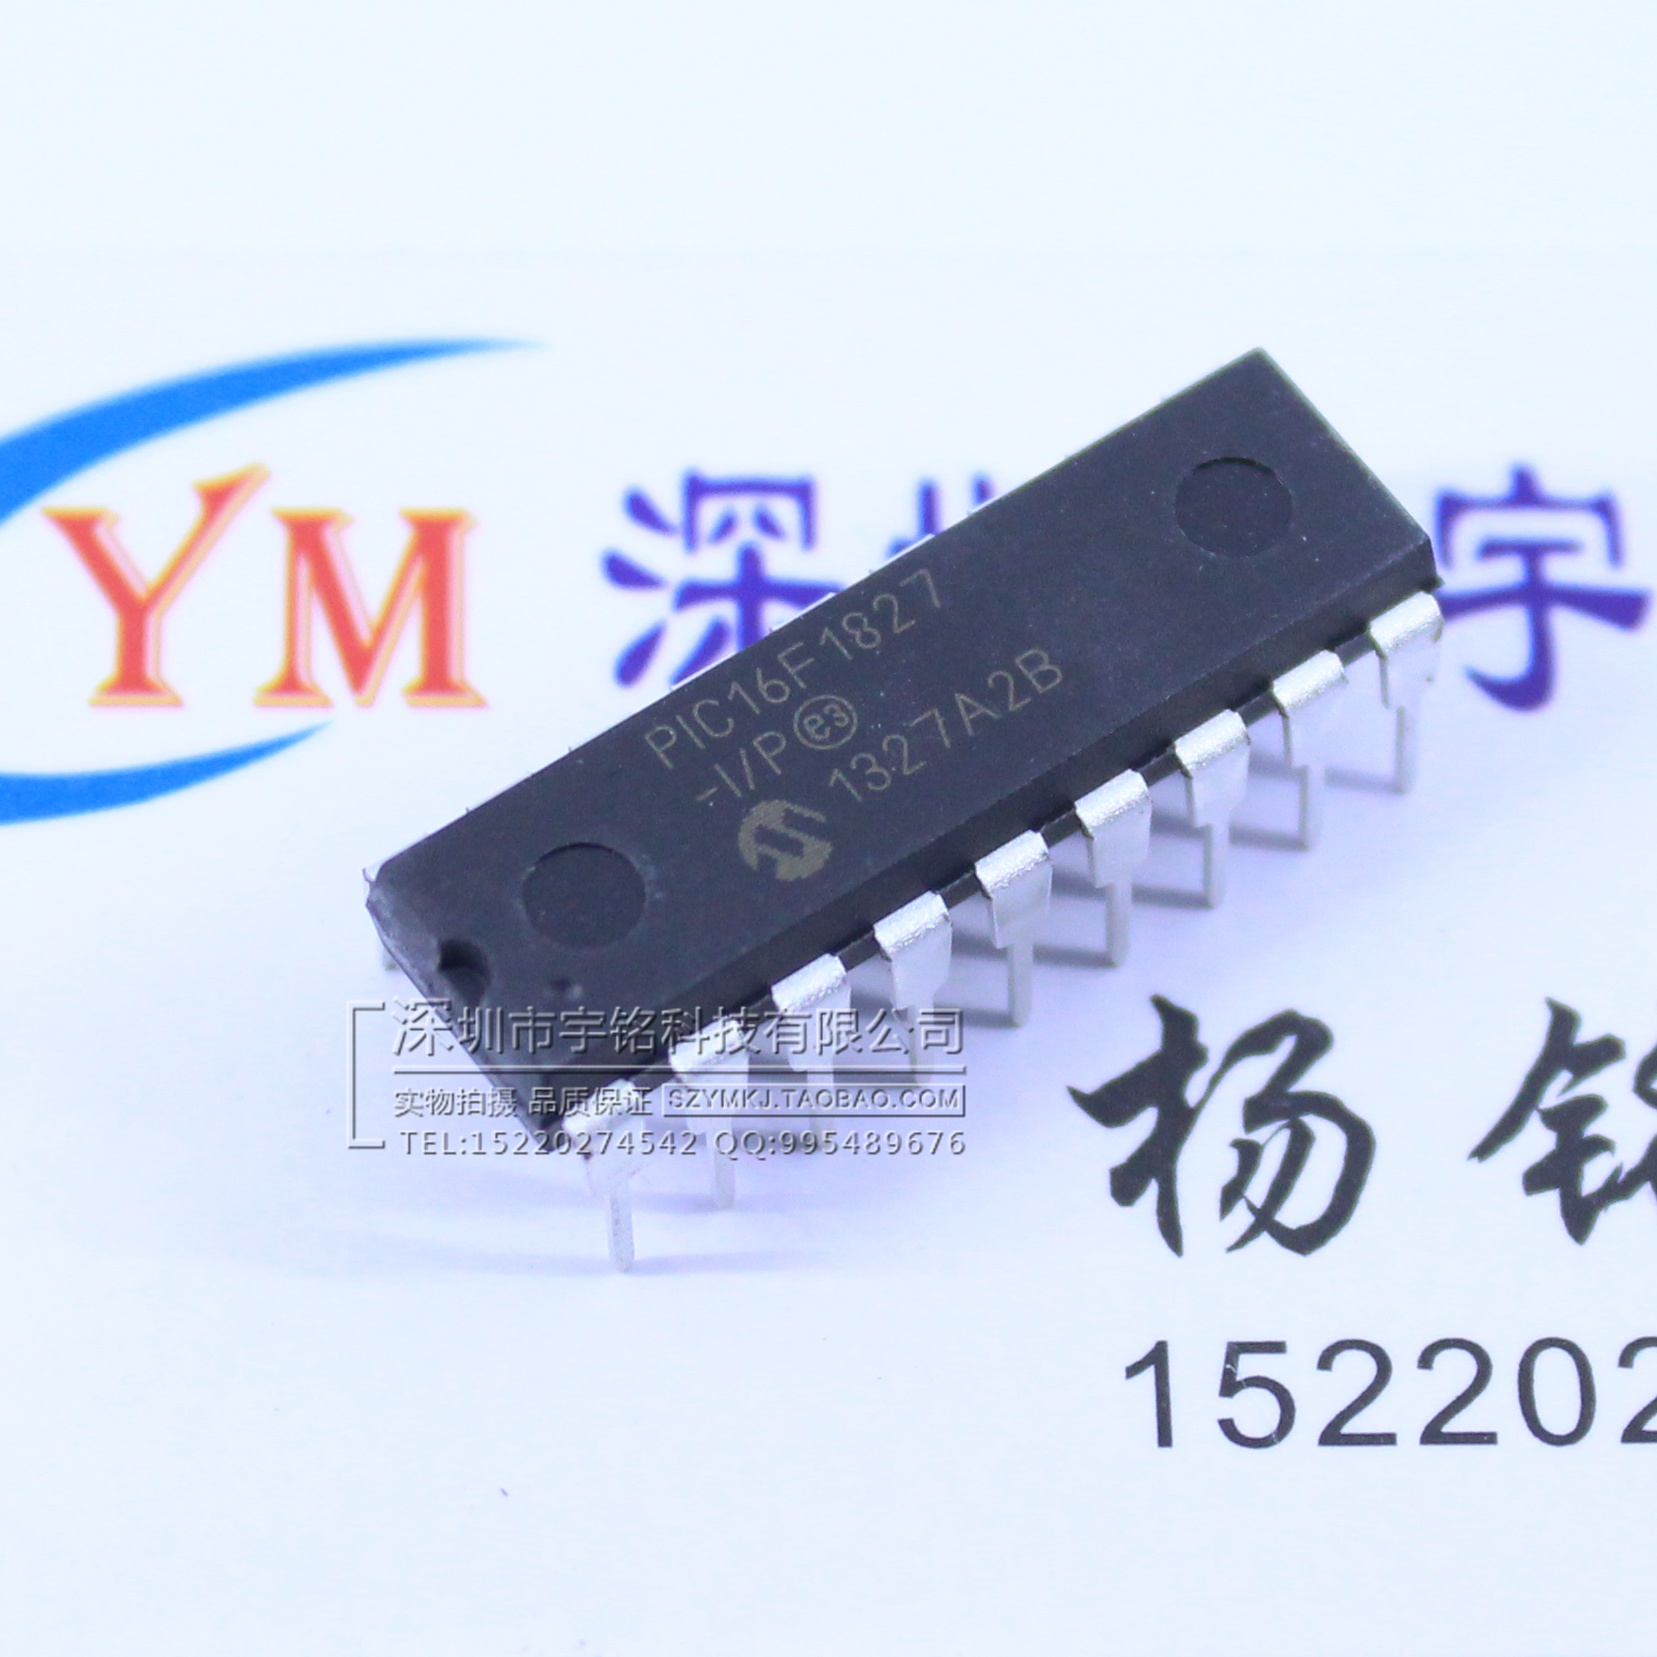 MIC microchip microcontroller PIC16F1827-I/P DIP-18 original--YMKJ2